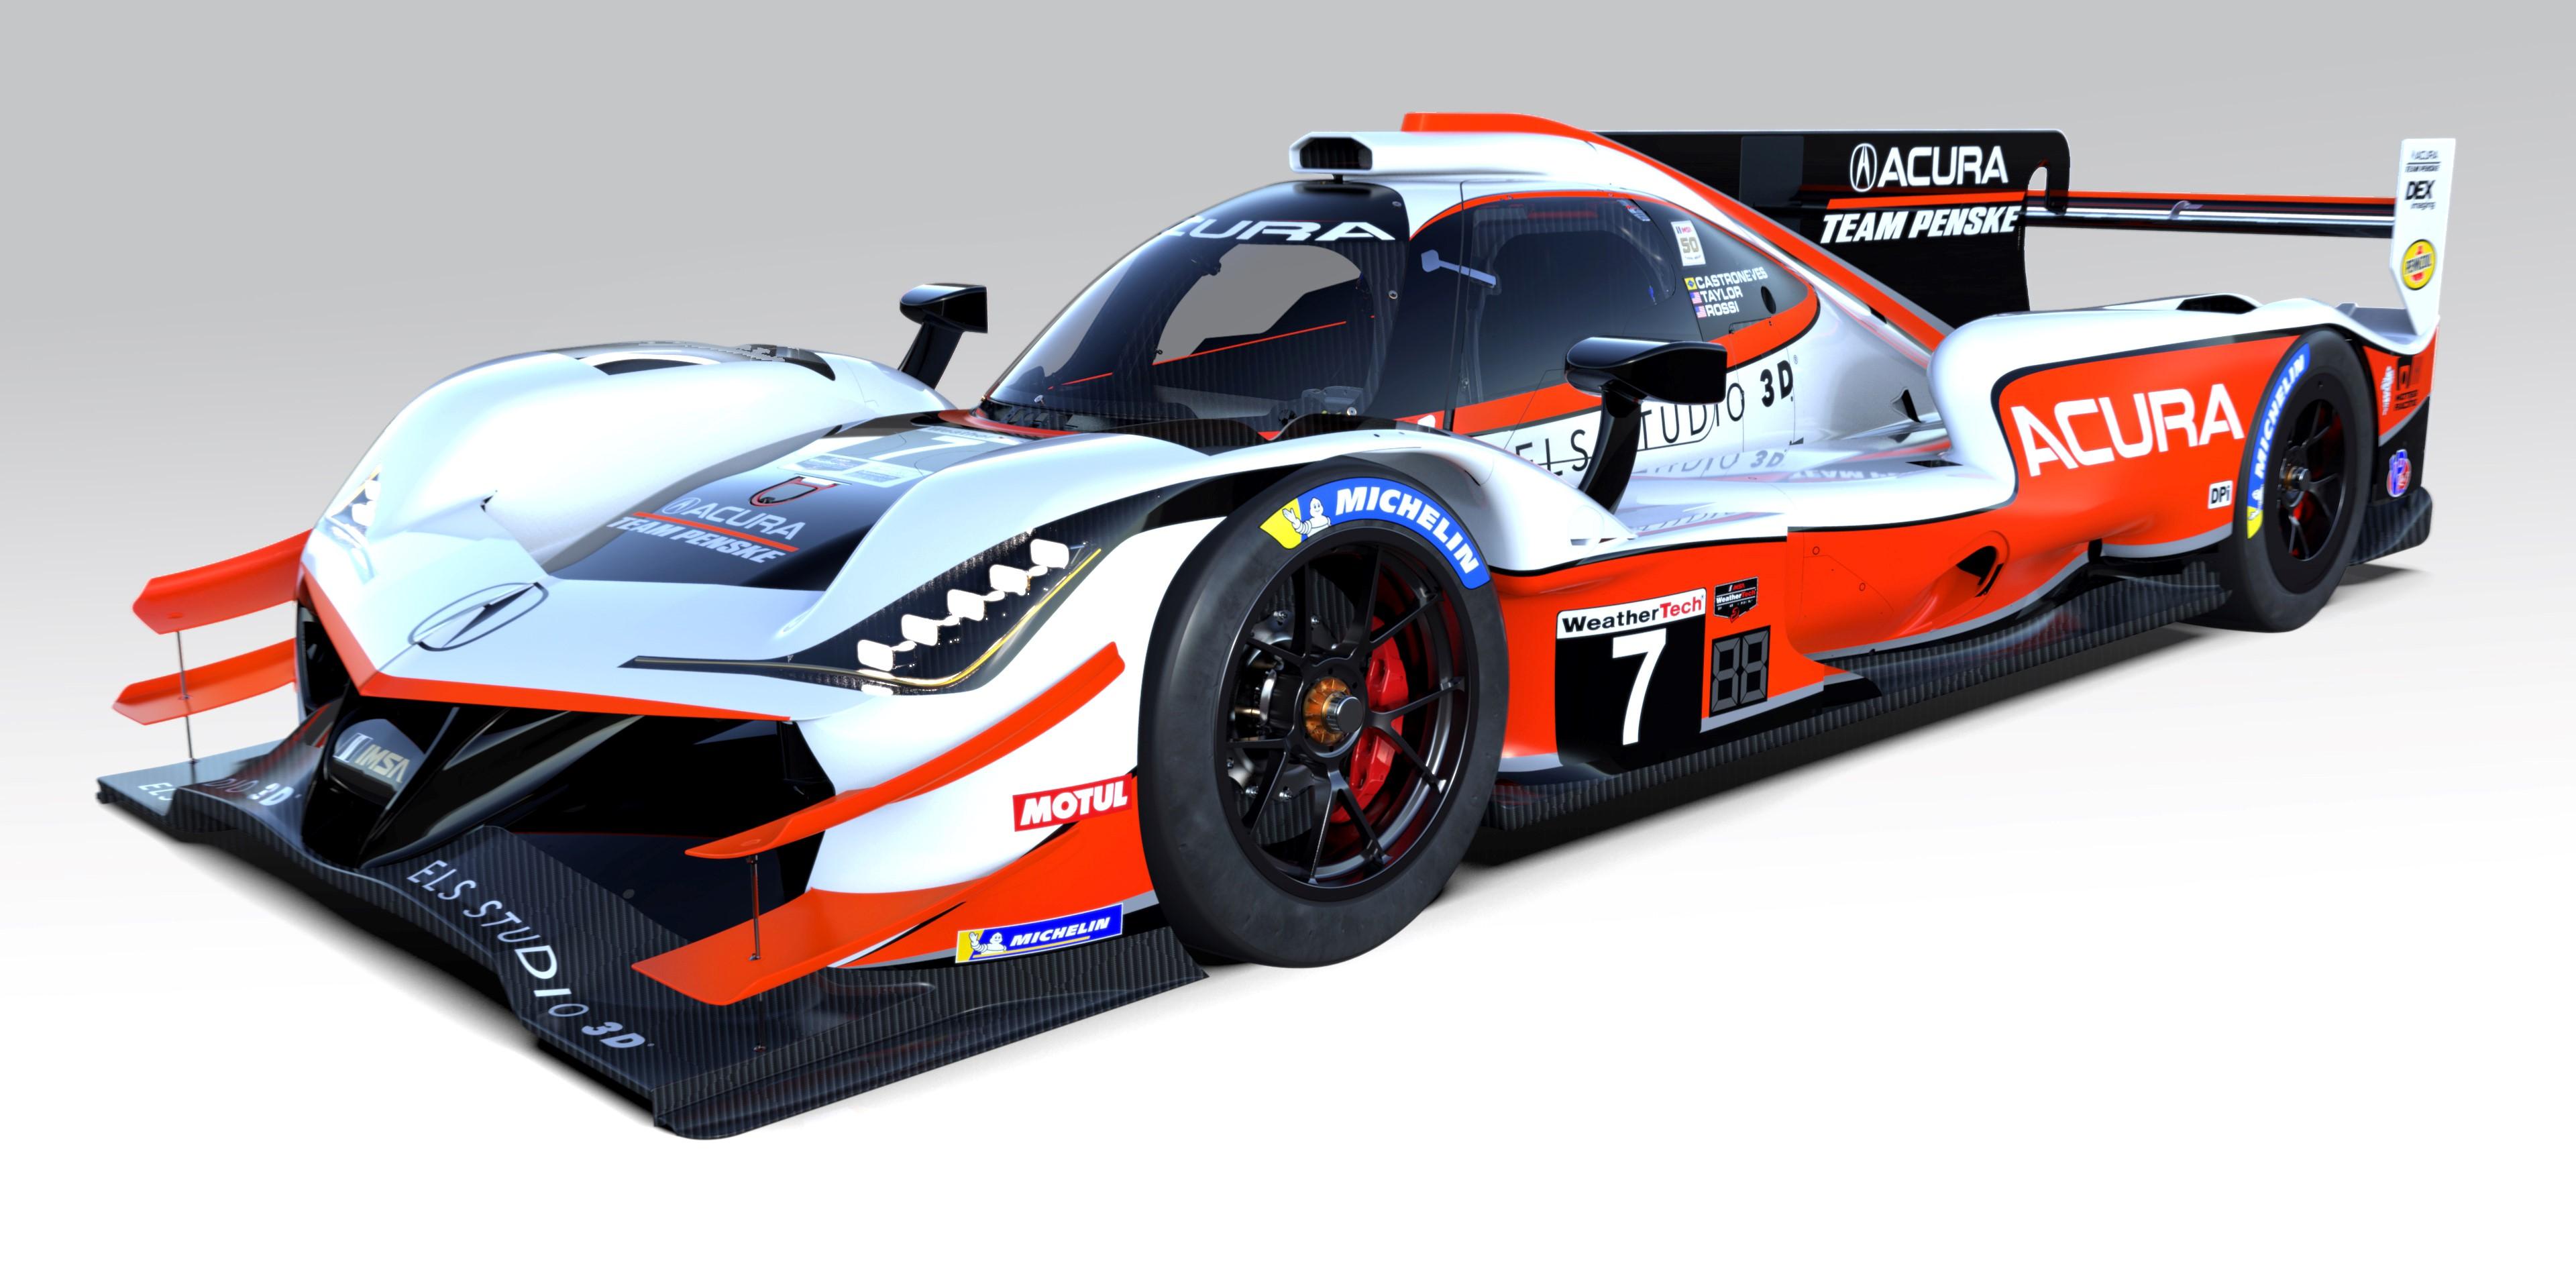 2019 Acura Team Penske No. 7 ARX-05 Prototype